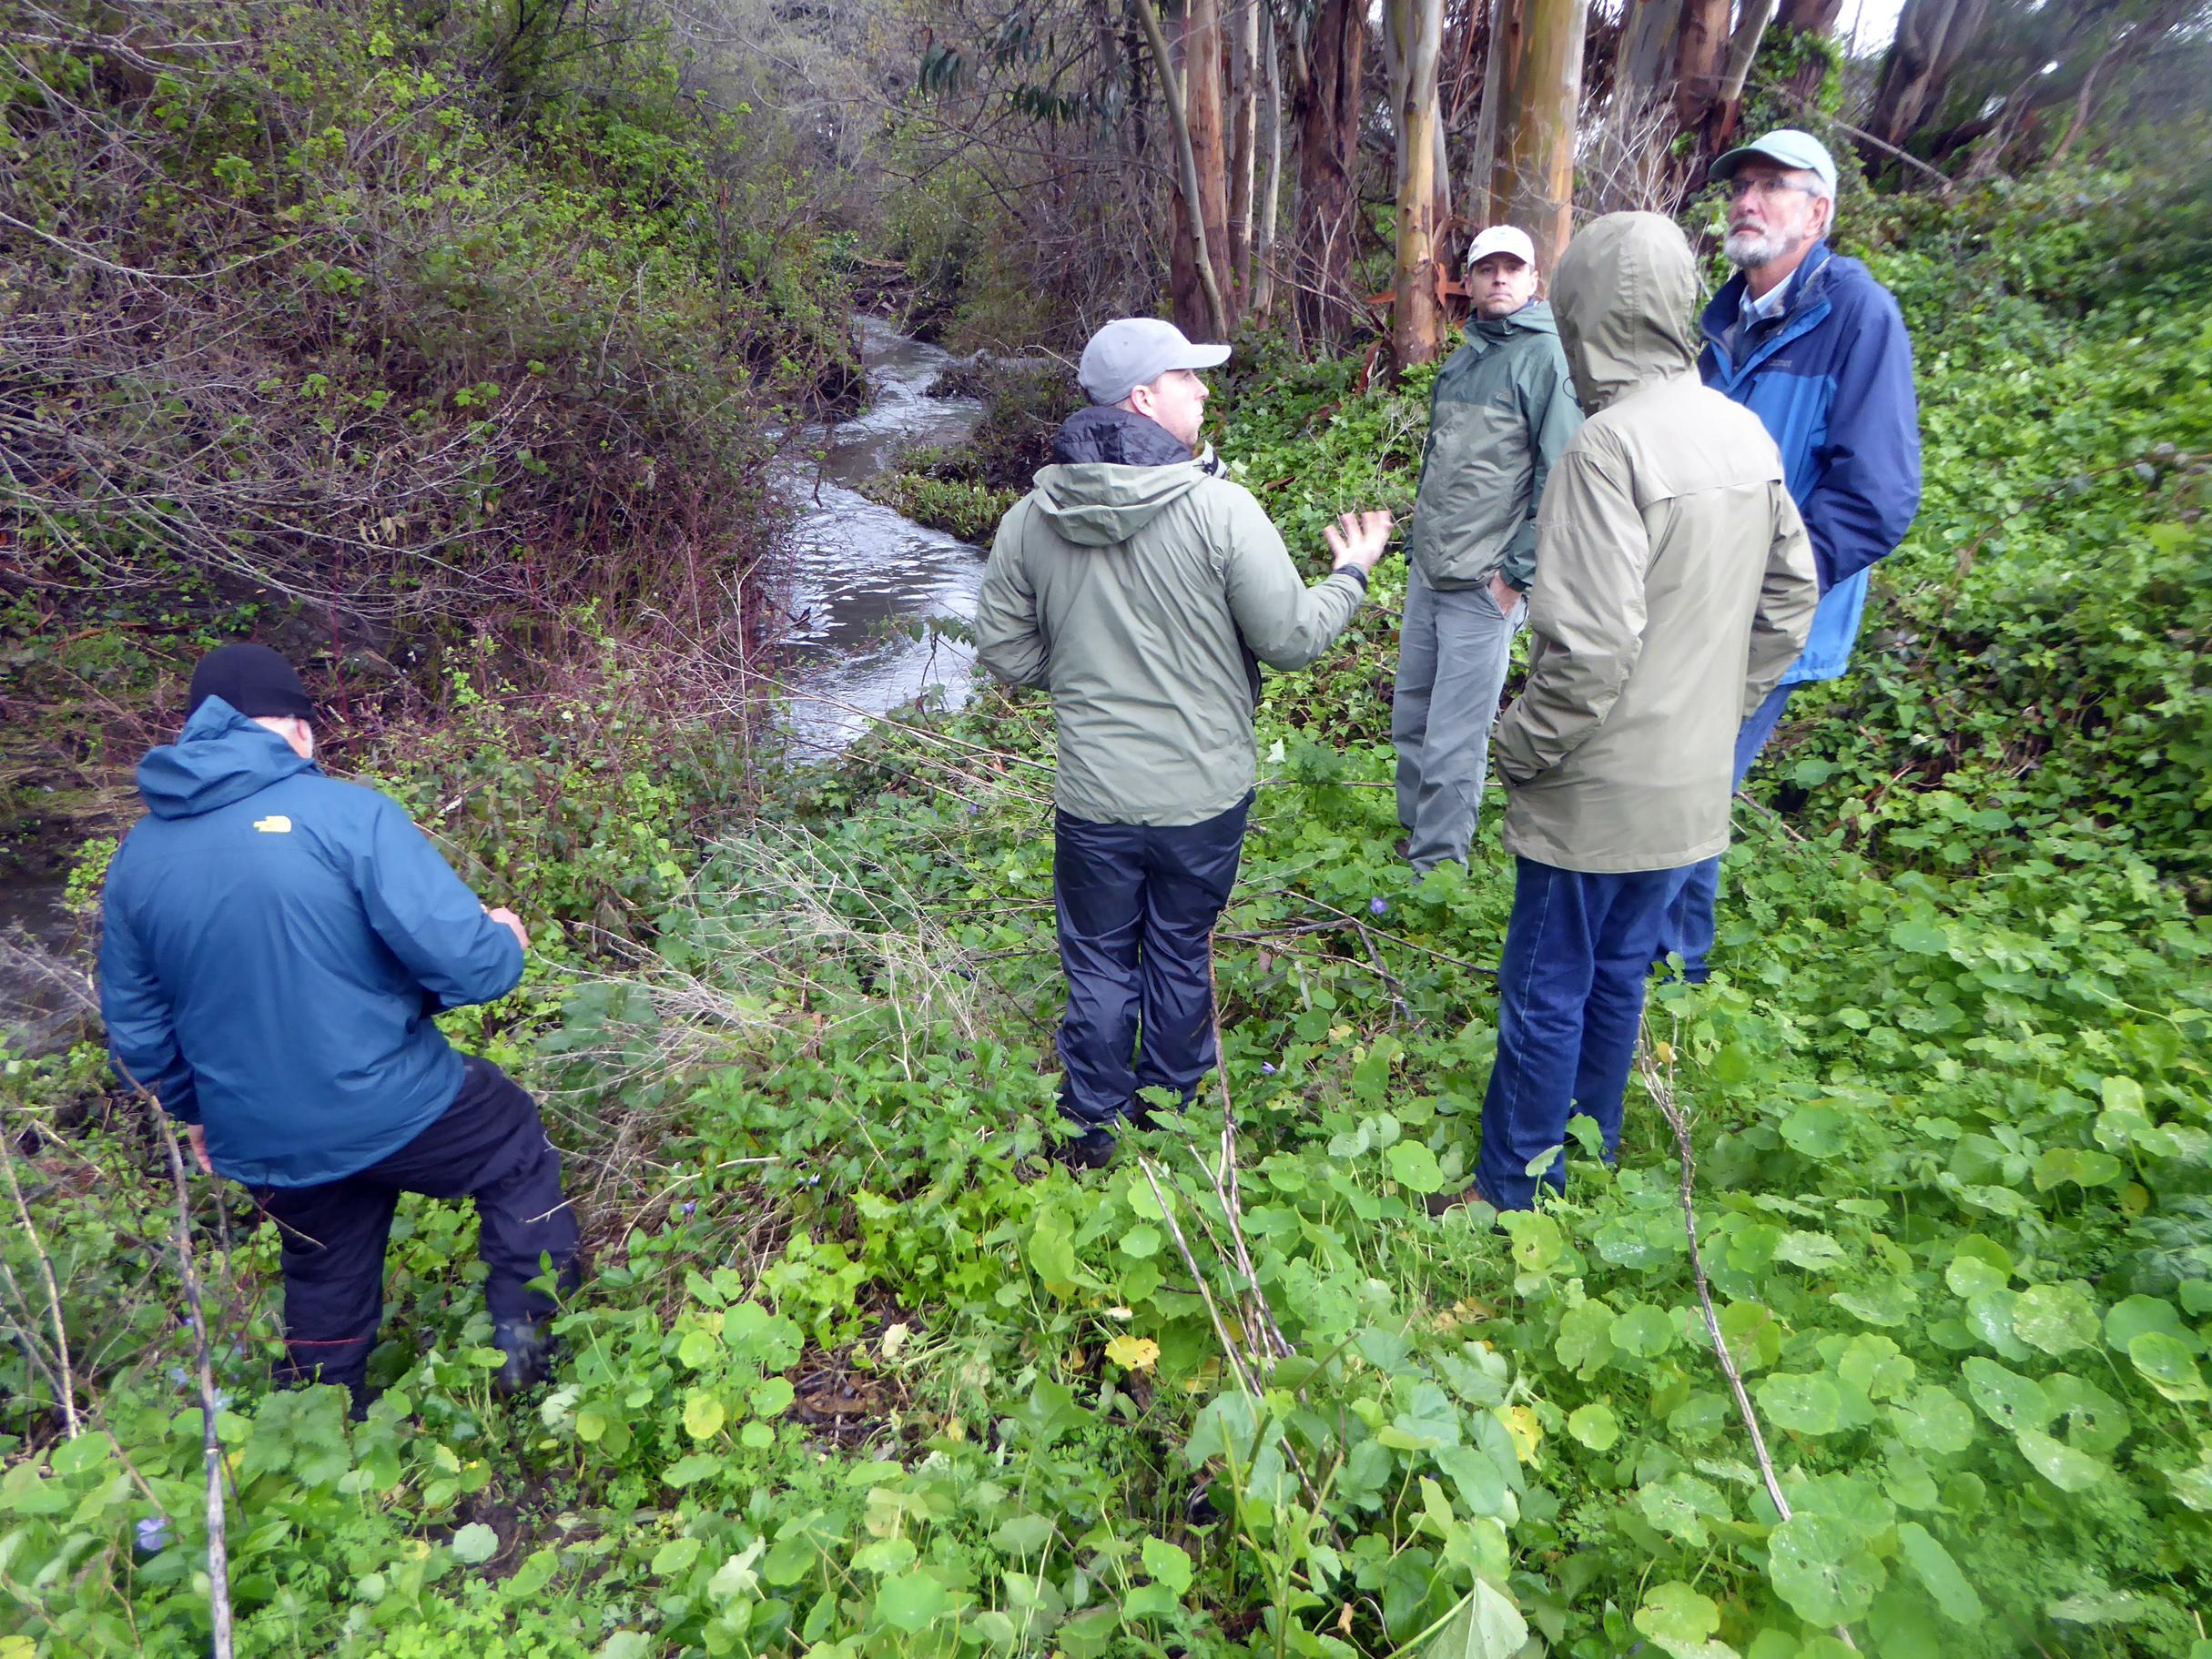 SPC 0132 Main  Stem 2-26-19 Creek walk w-NOAA & CA Trout SLWalker P1190021.jpg